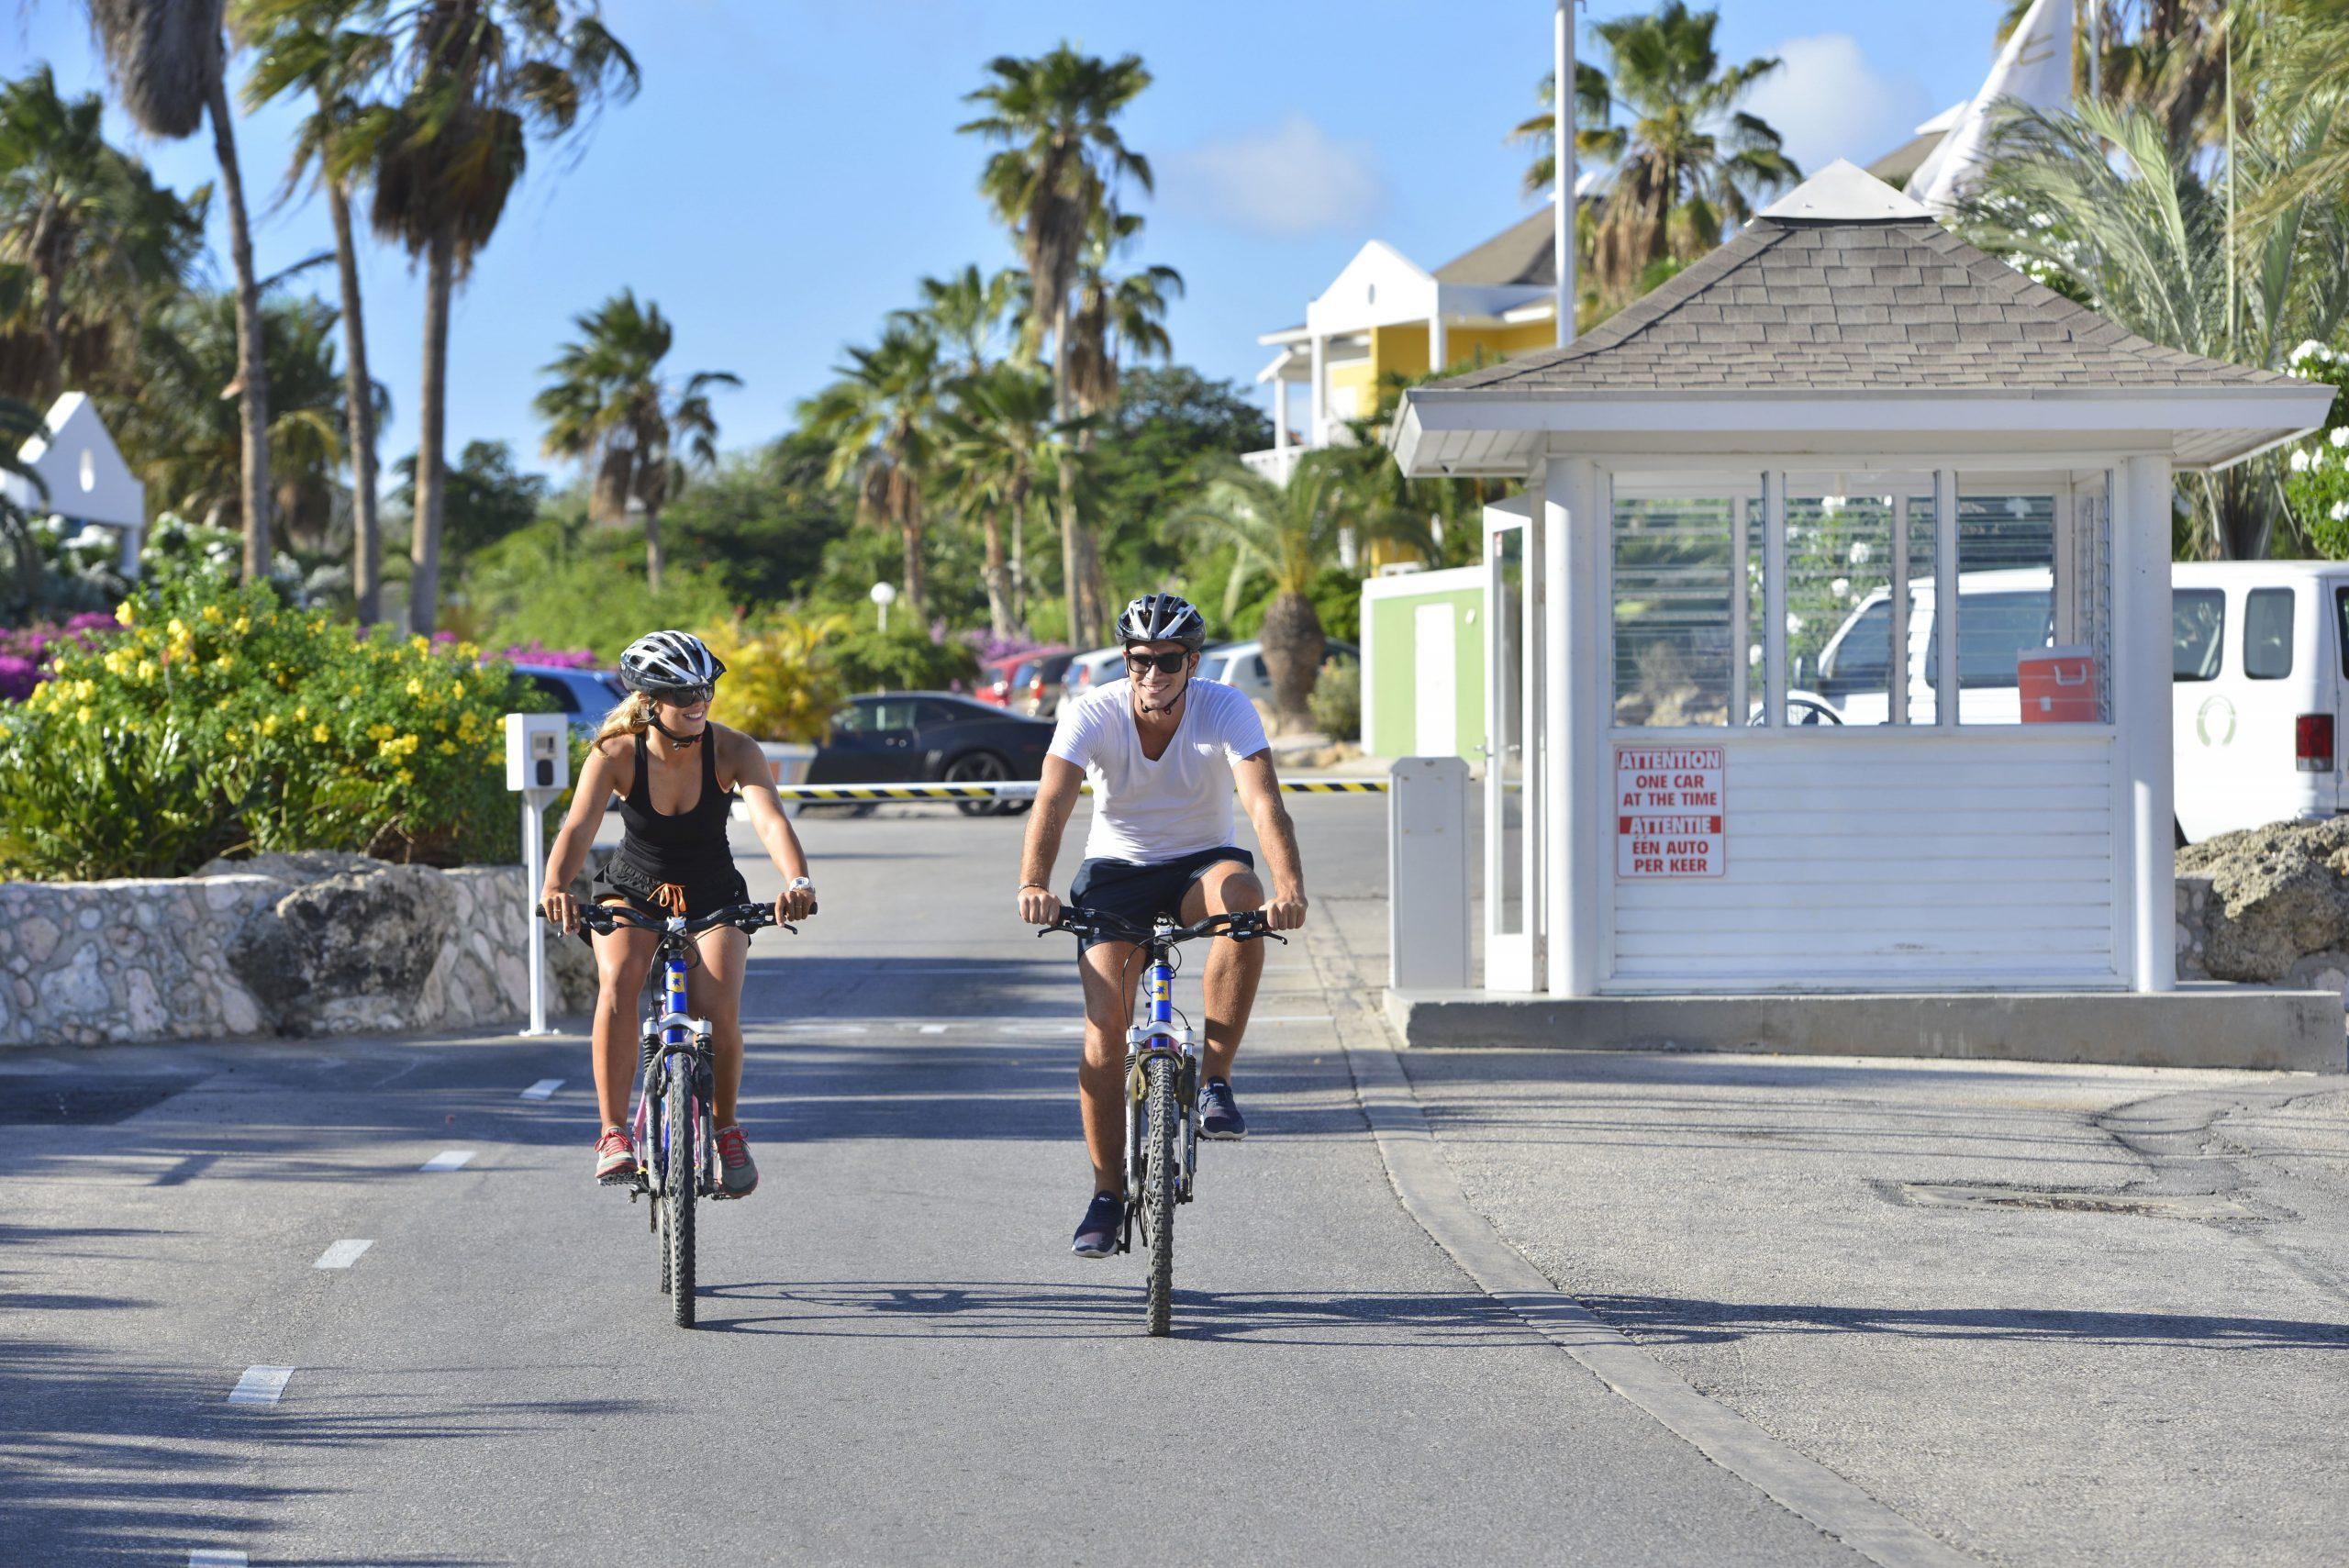 Tourists riding a rental bike at Chogogo Curacao.